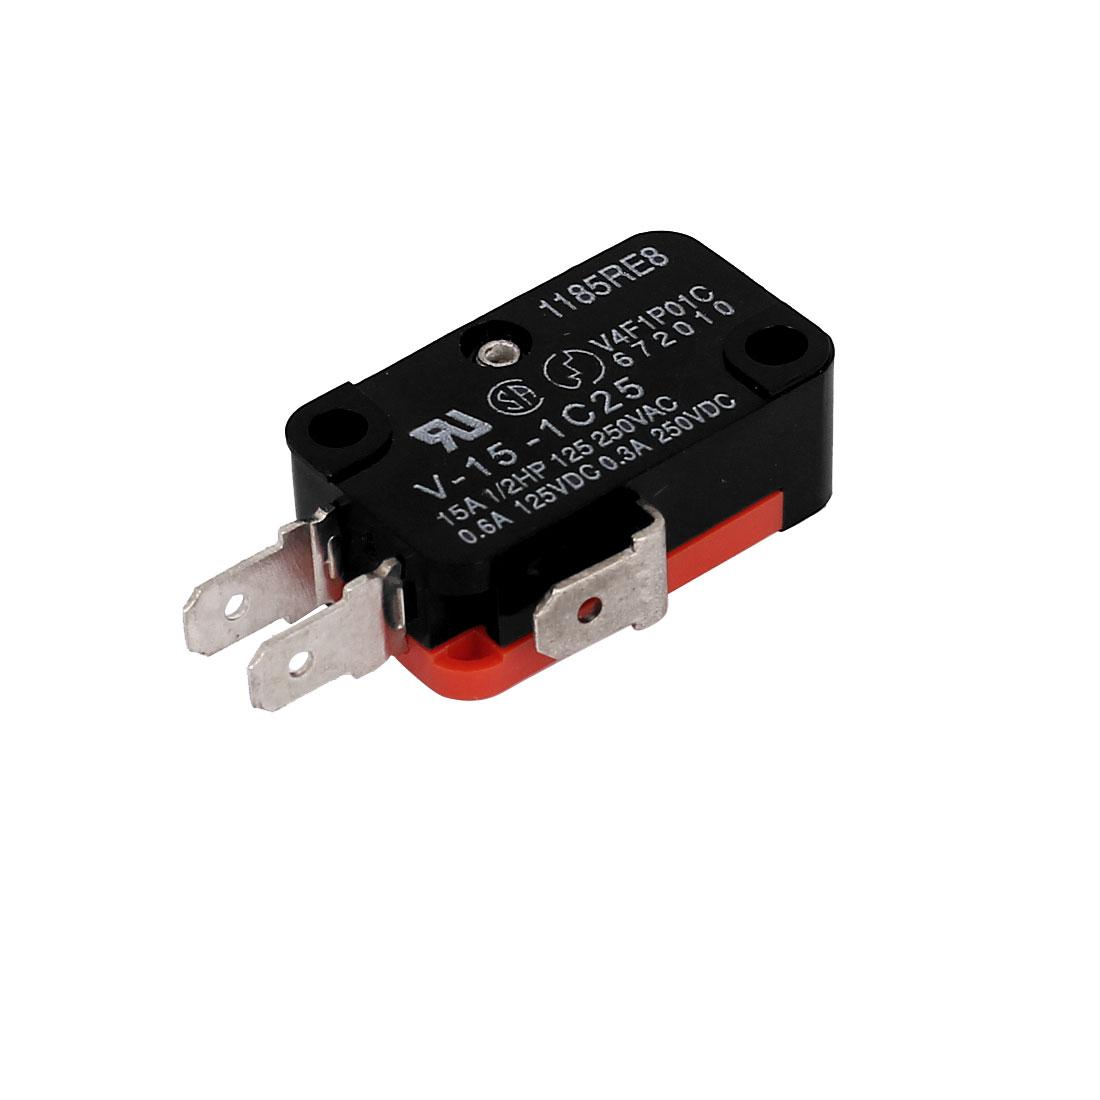 SPDT 3 Terminals Momentary Micro Switch 15A AC125/250V 0.6A DC125V 0.3A DC250V